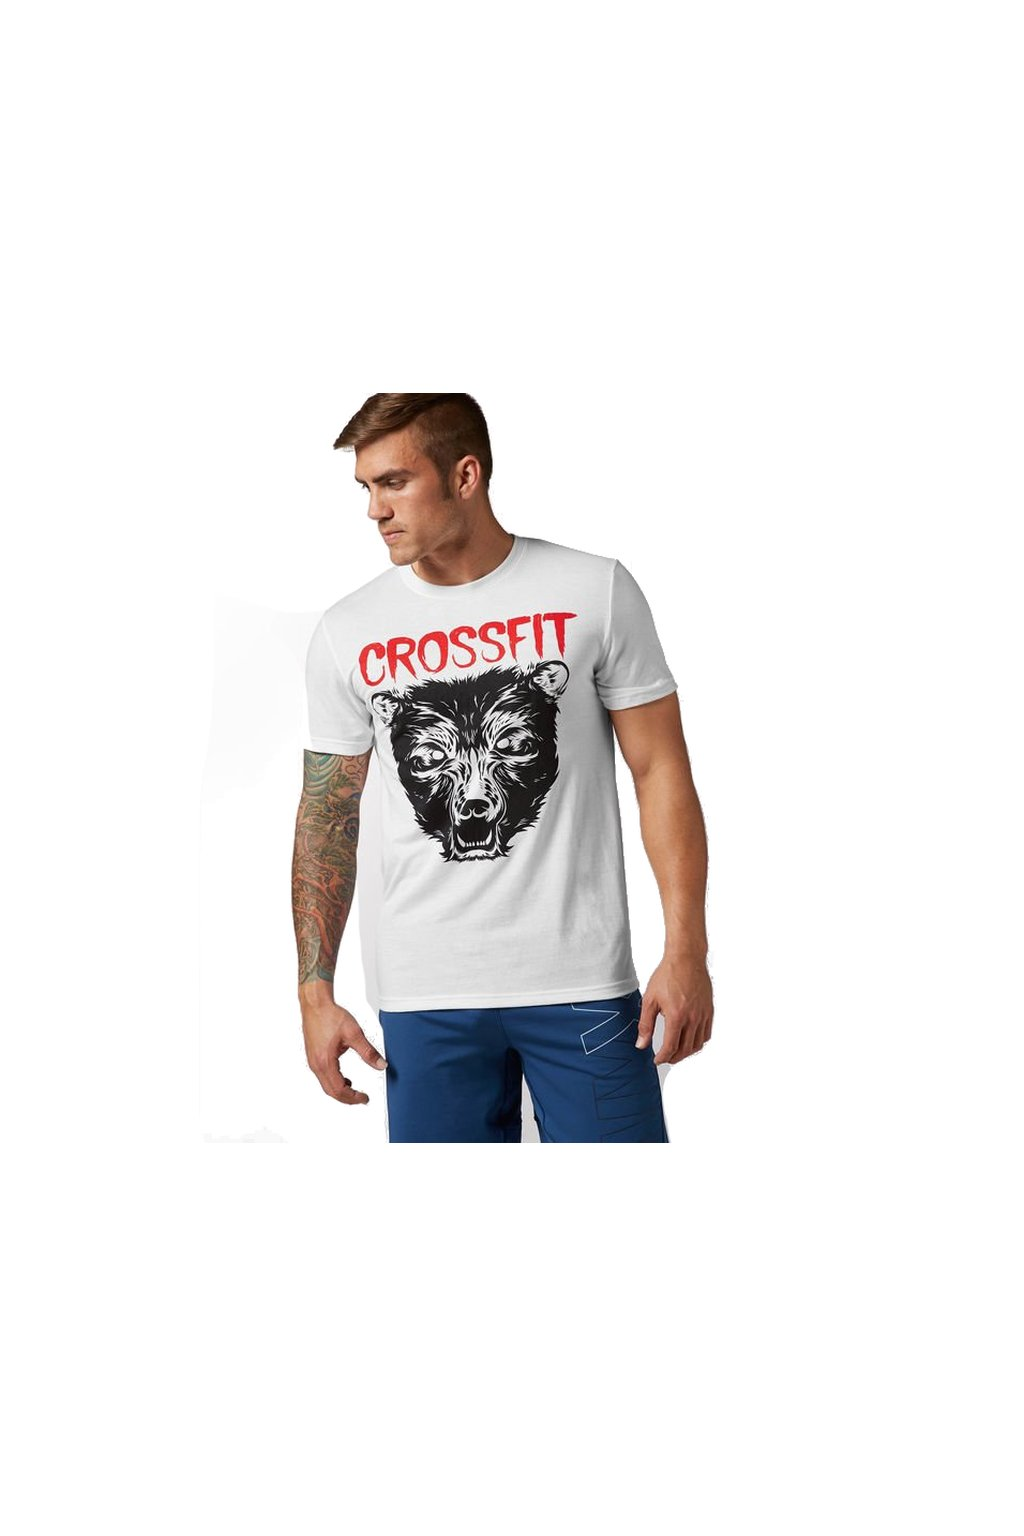 7388c1d58c484 eng pl T Shirt Reebok CrossFit Bear Tee B83985 38229 1